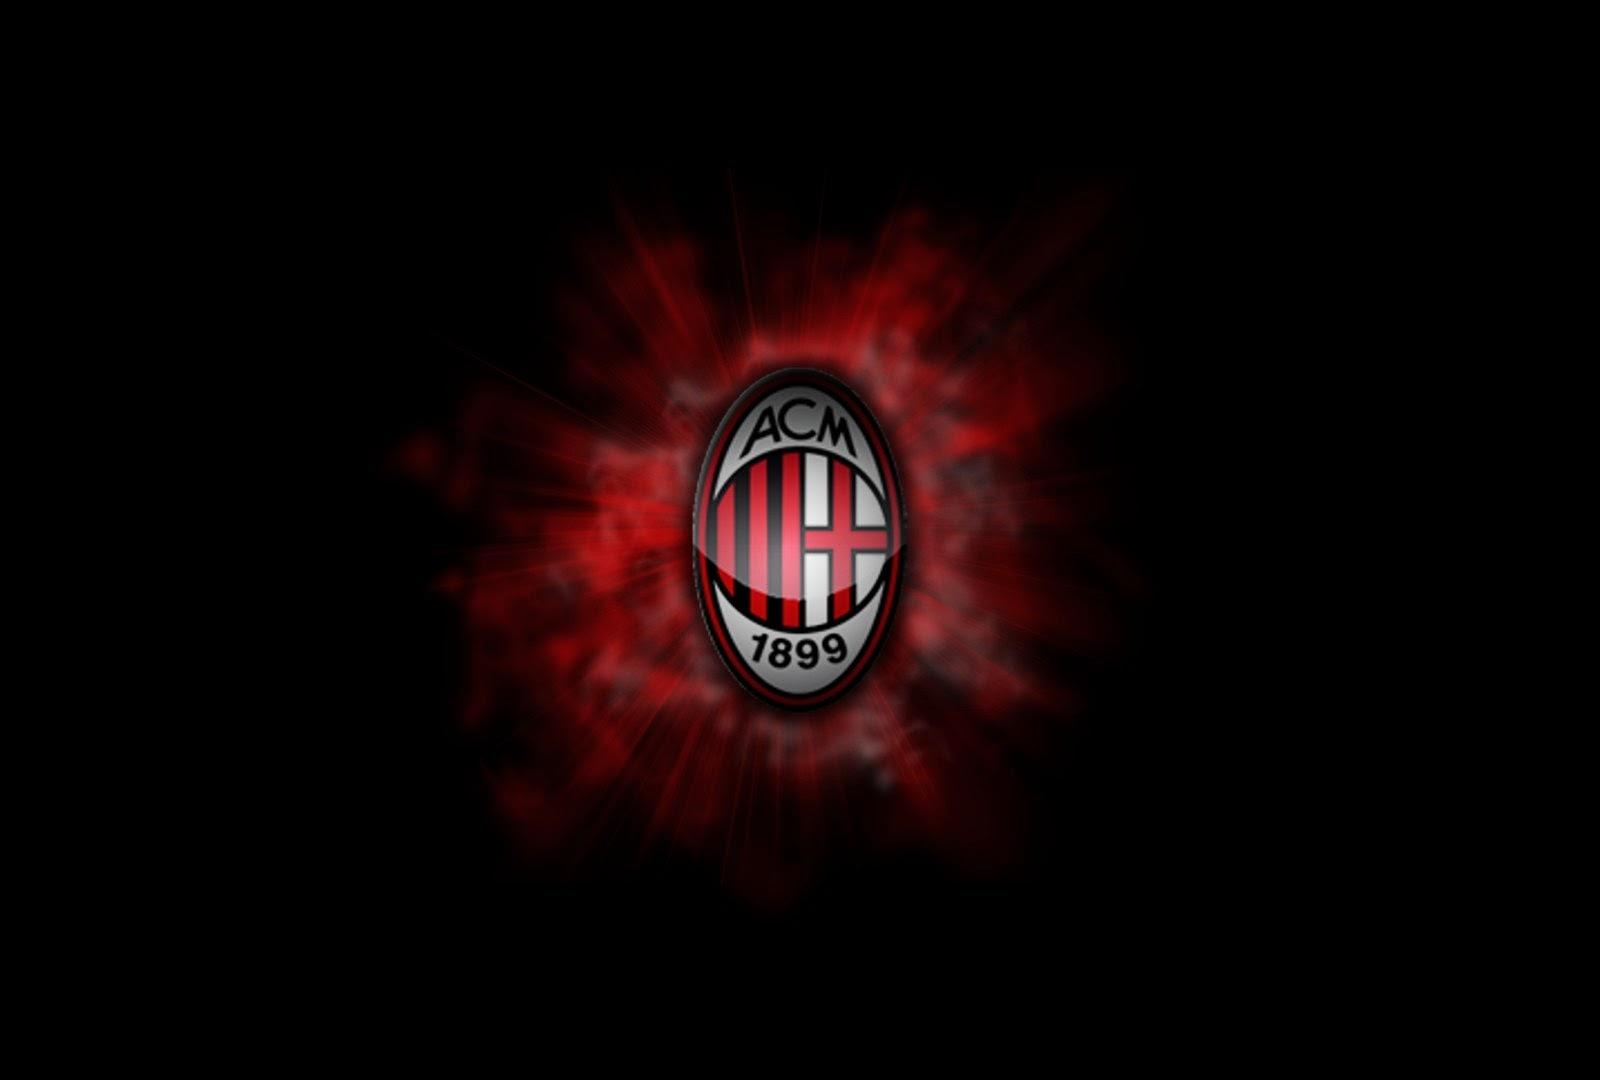 AC Milan Wallpapers ac milan screensavers 8371 1600x1080